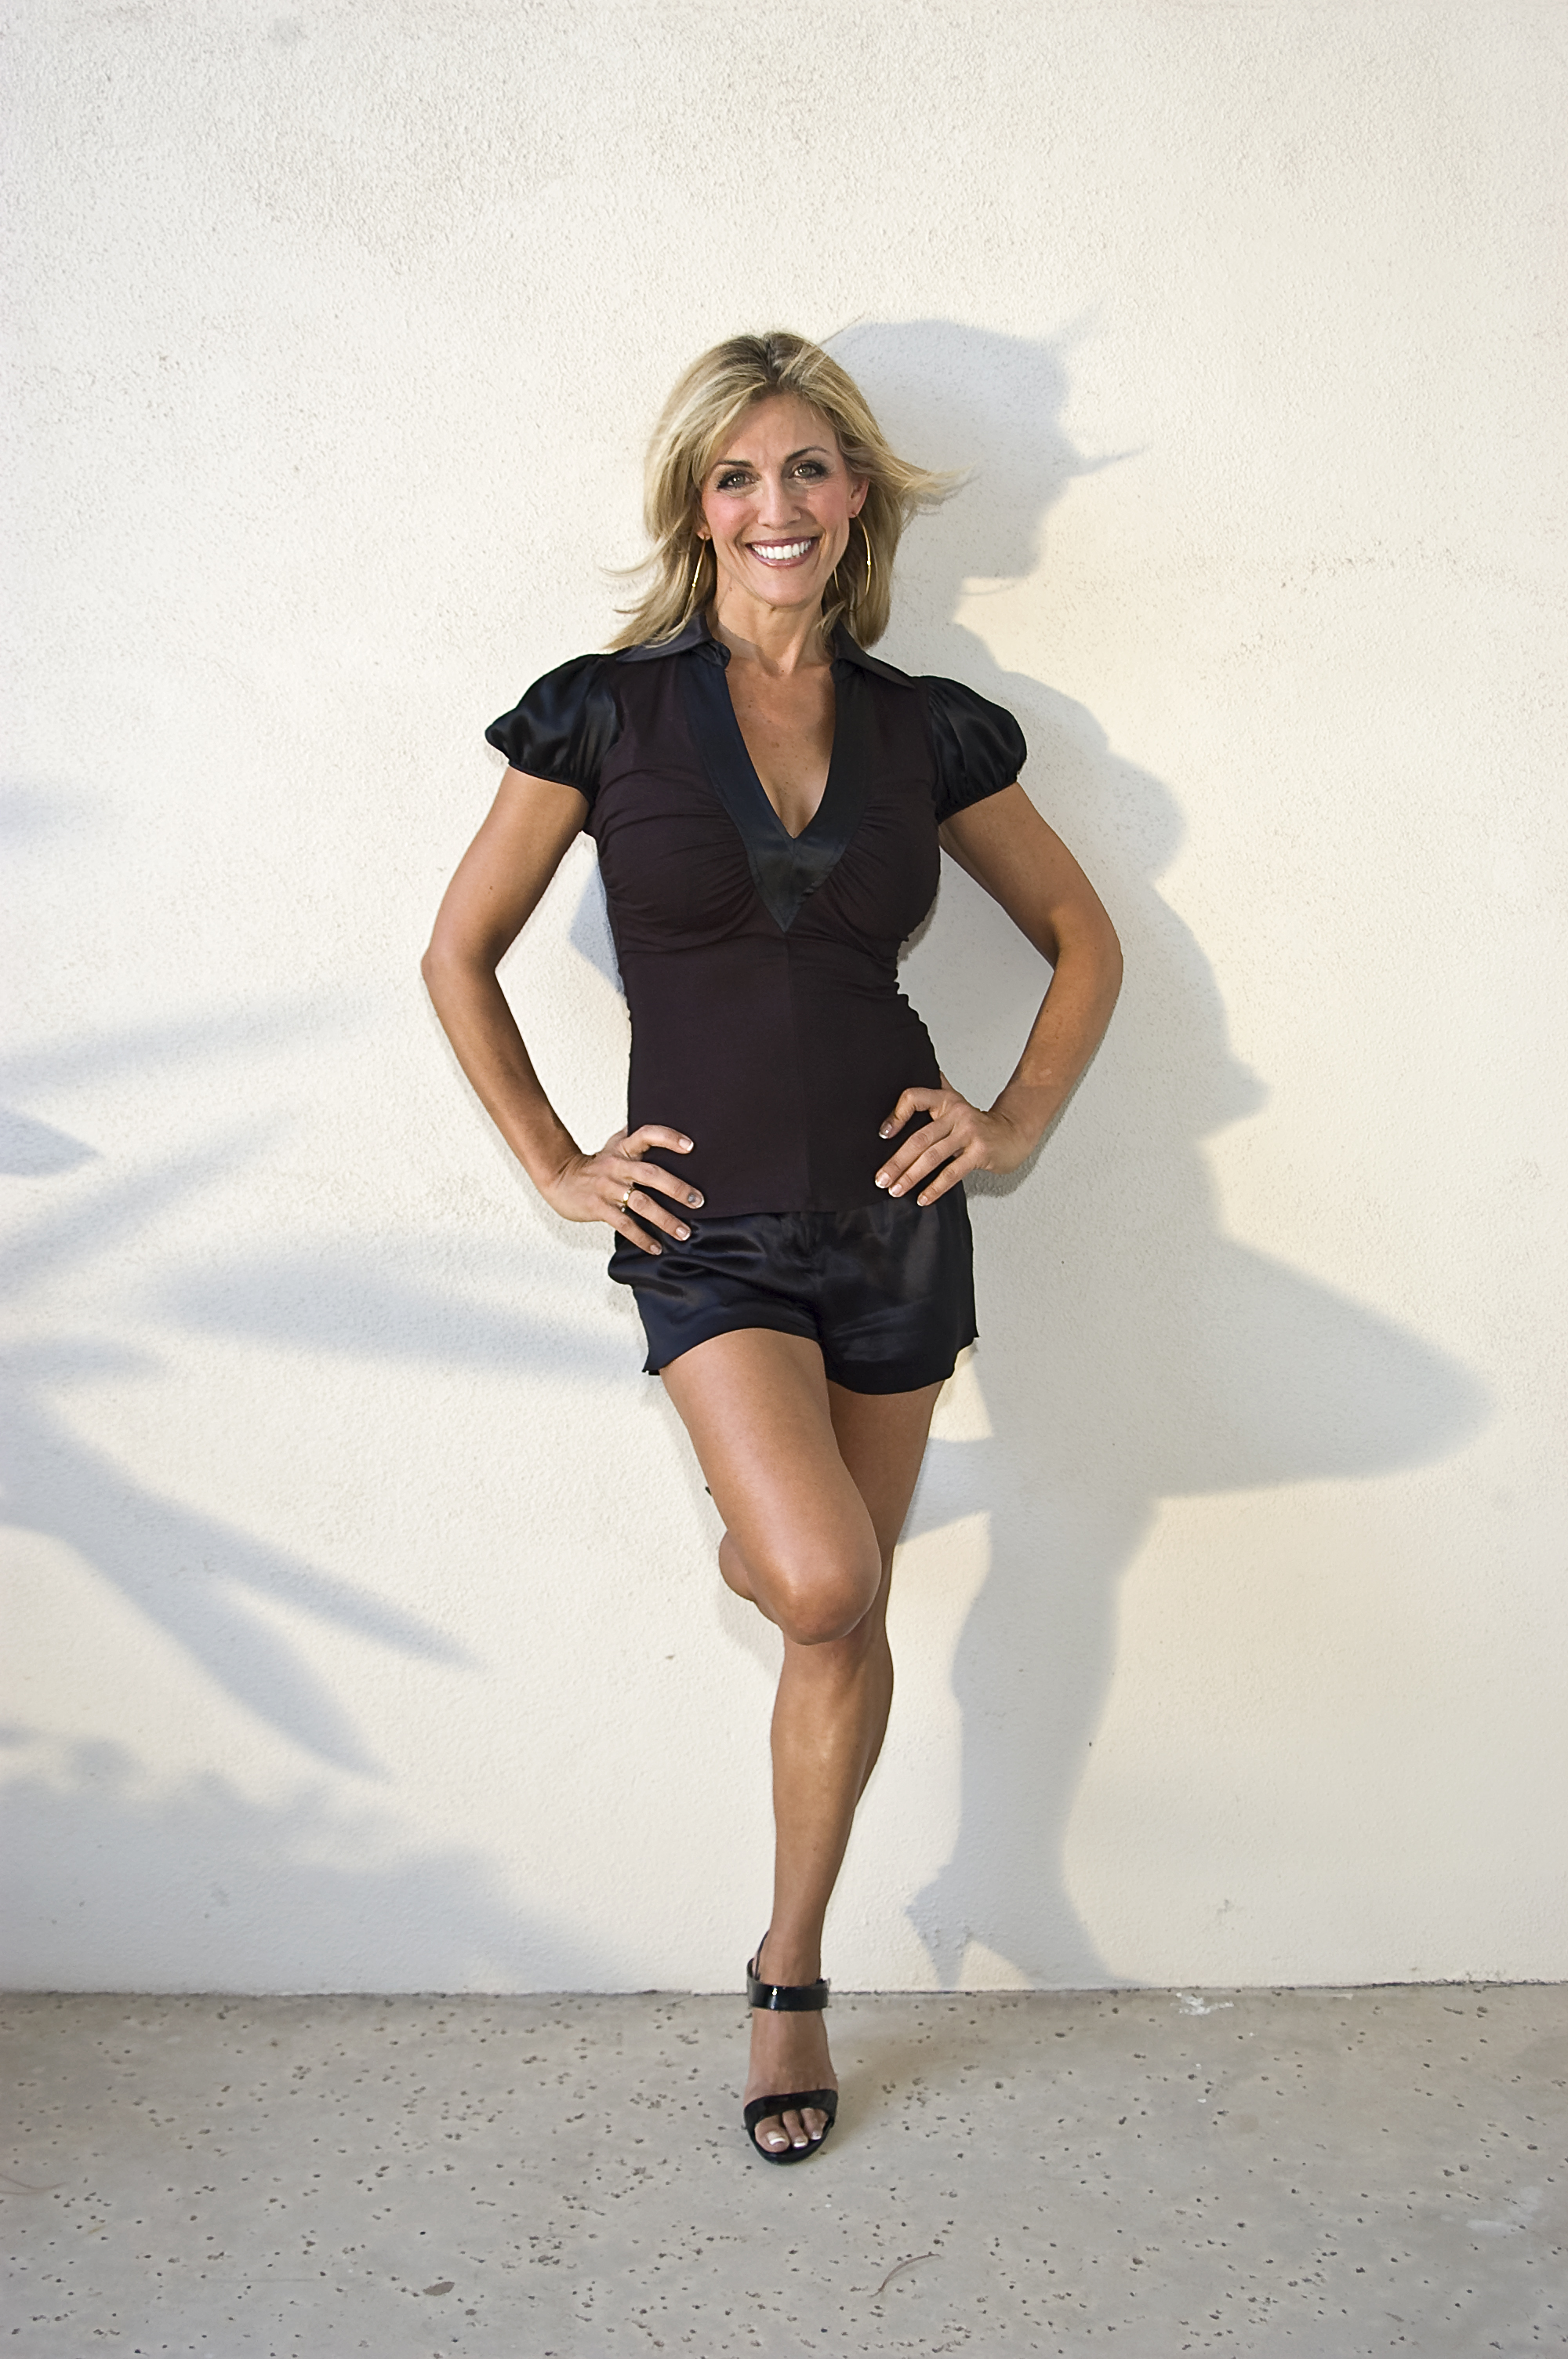 Fitness Expert Kathleen Pagnini